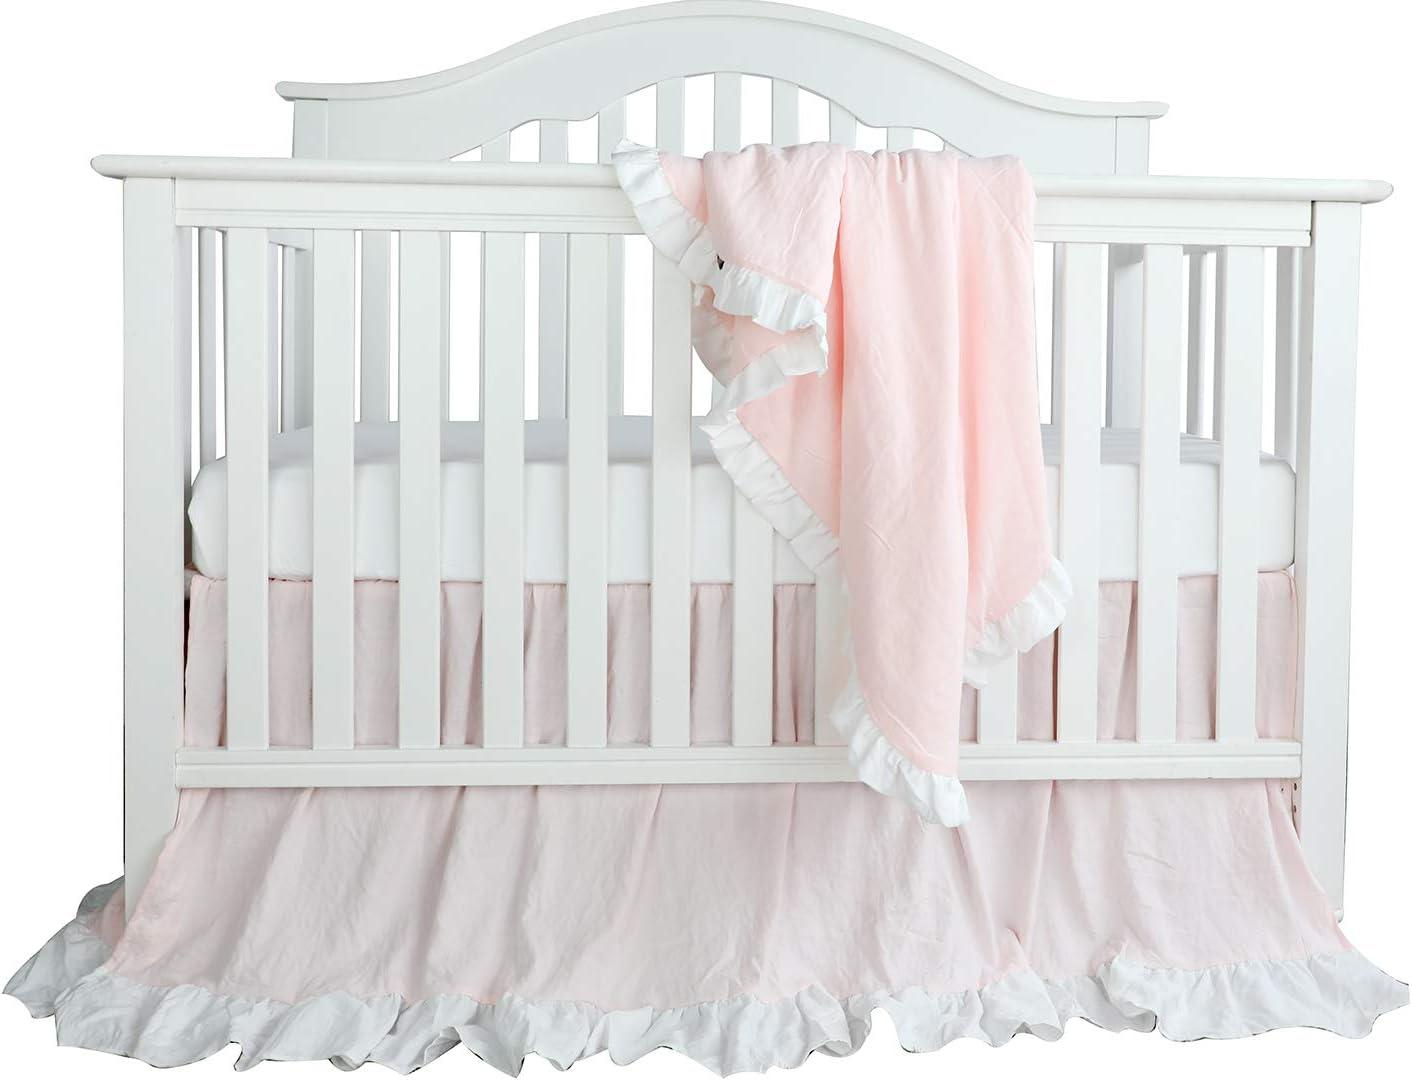 Blush Coral Pink Ruffle Crib Bedding Set Baby Girl Bedding Blanket Nursery Crib Skirt Set Baby Girl Crib Bedding Sheet Lt Coral 3 Pieces Set Kitchen Dining